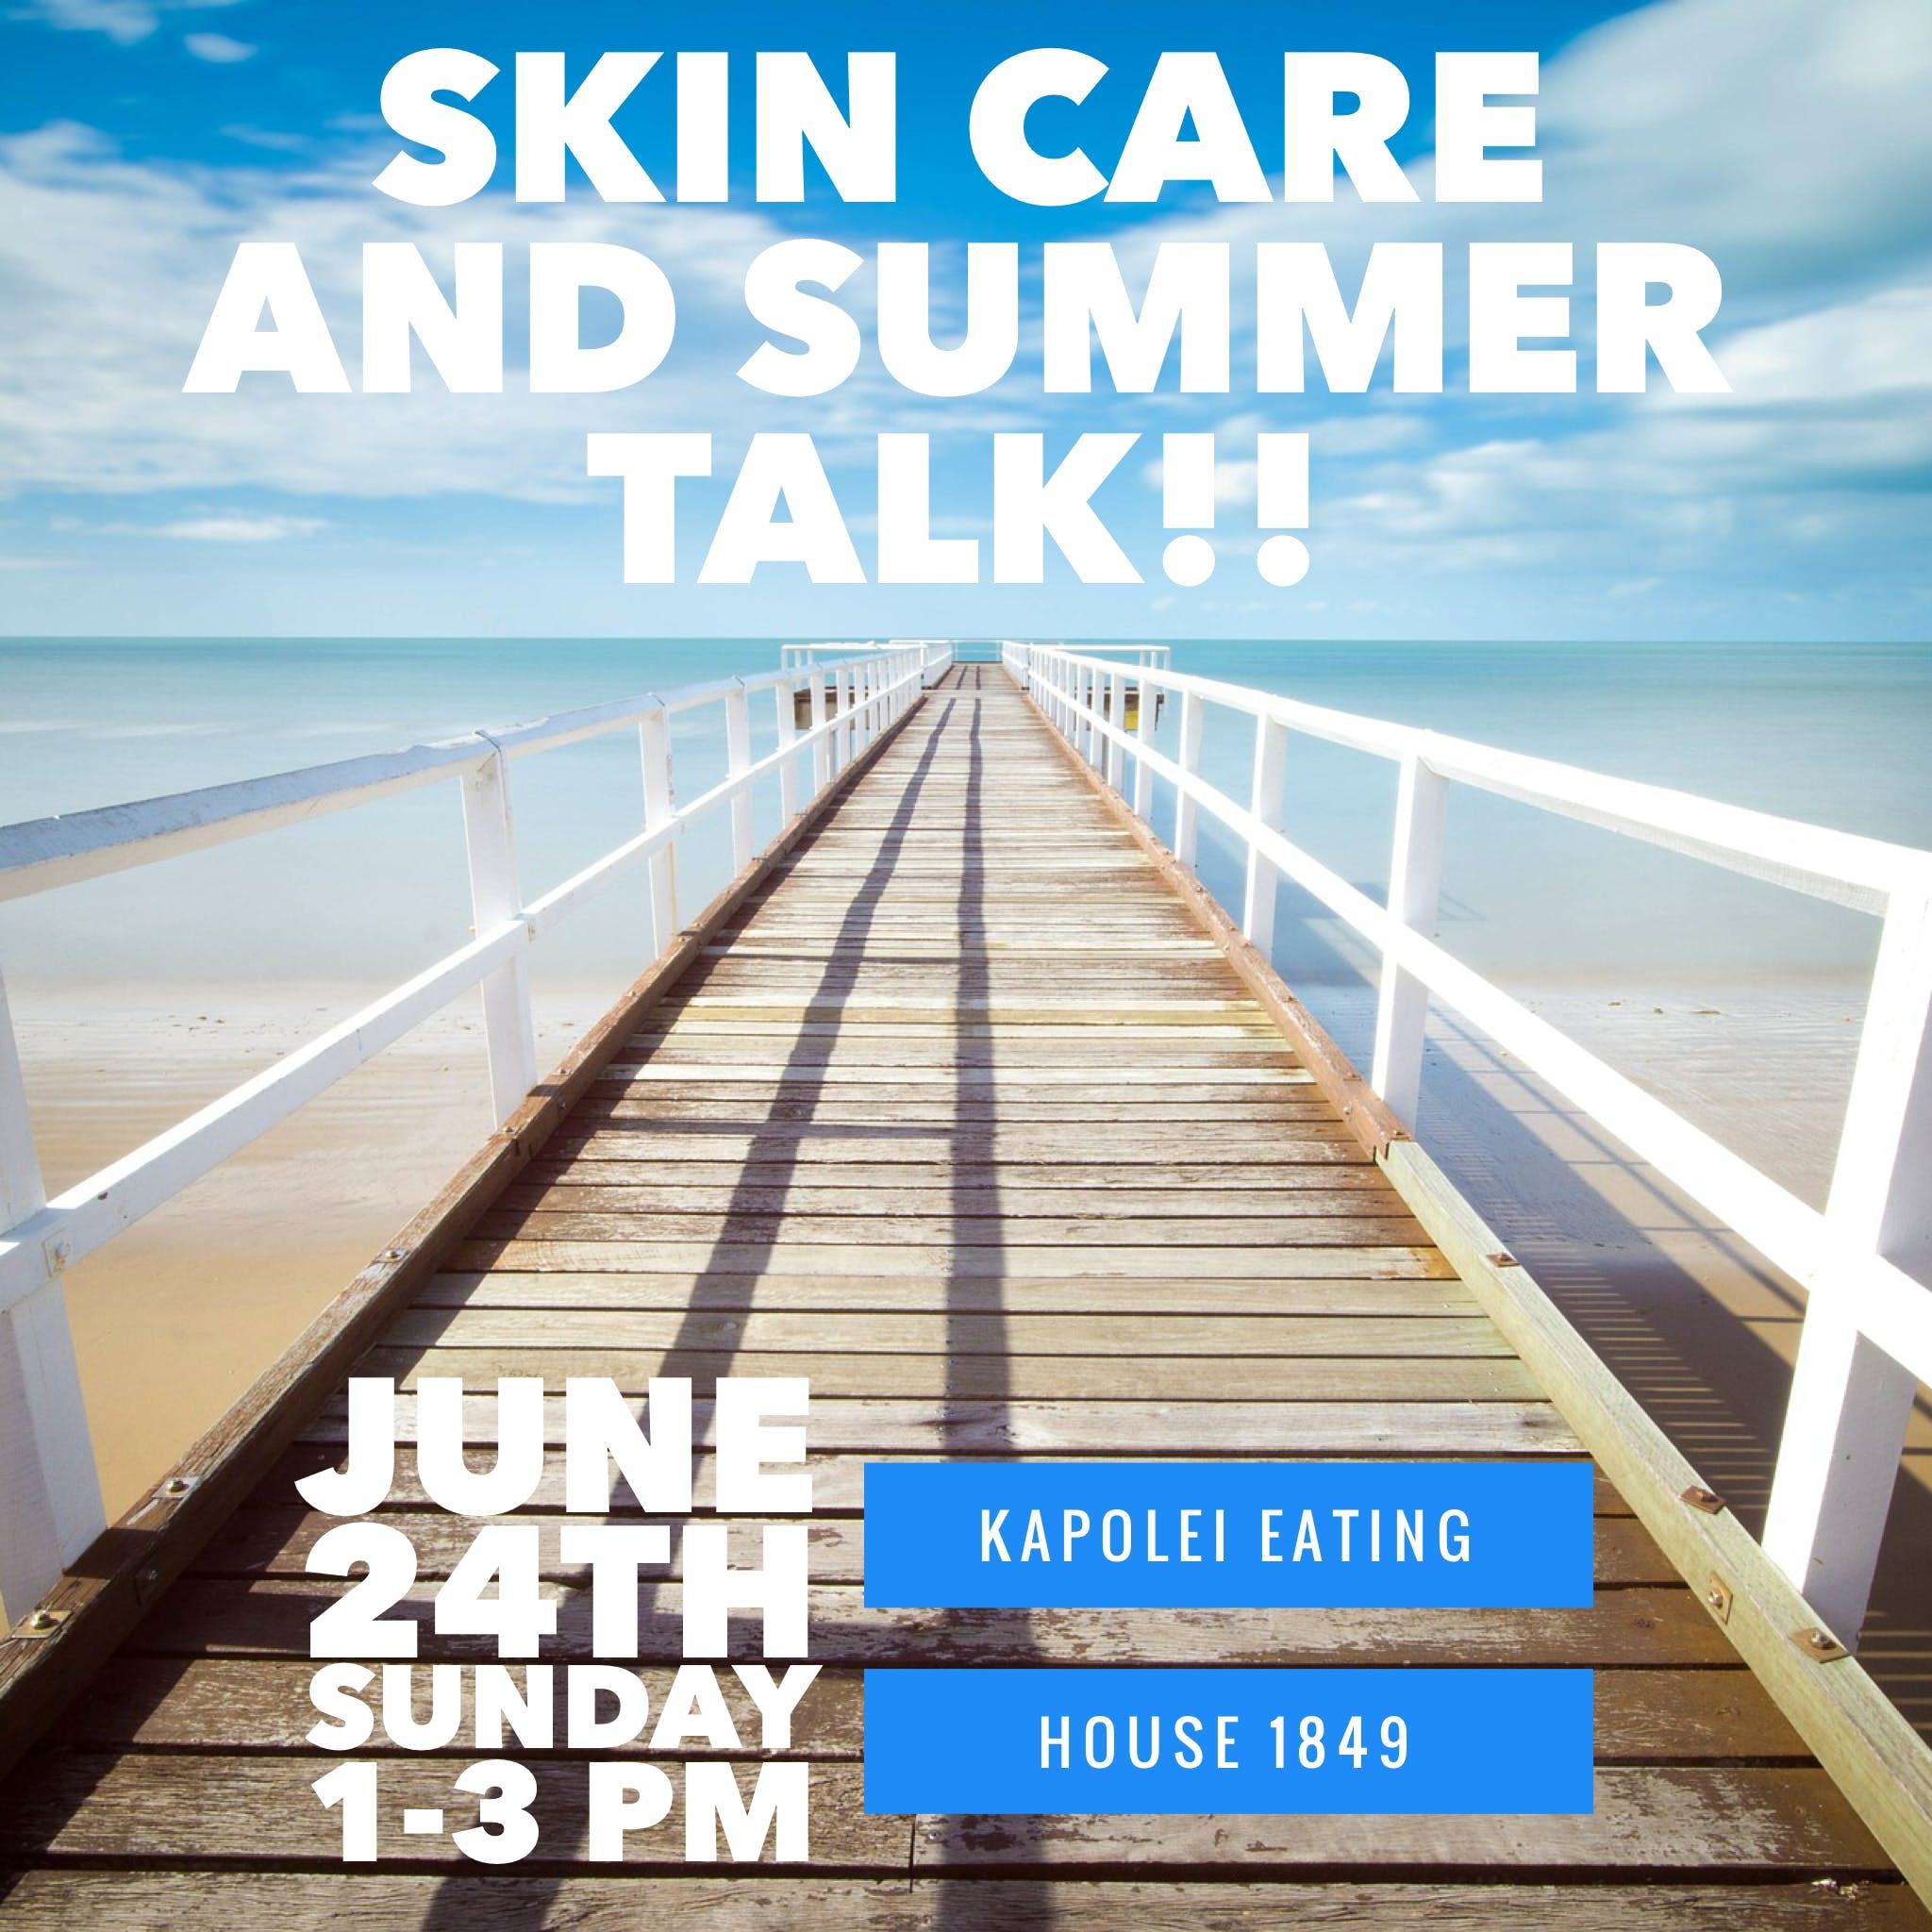 Skin Care and Summer Talk! at Eating House 1849 Kapolei, Kapolei